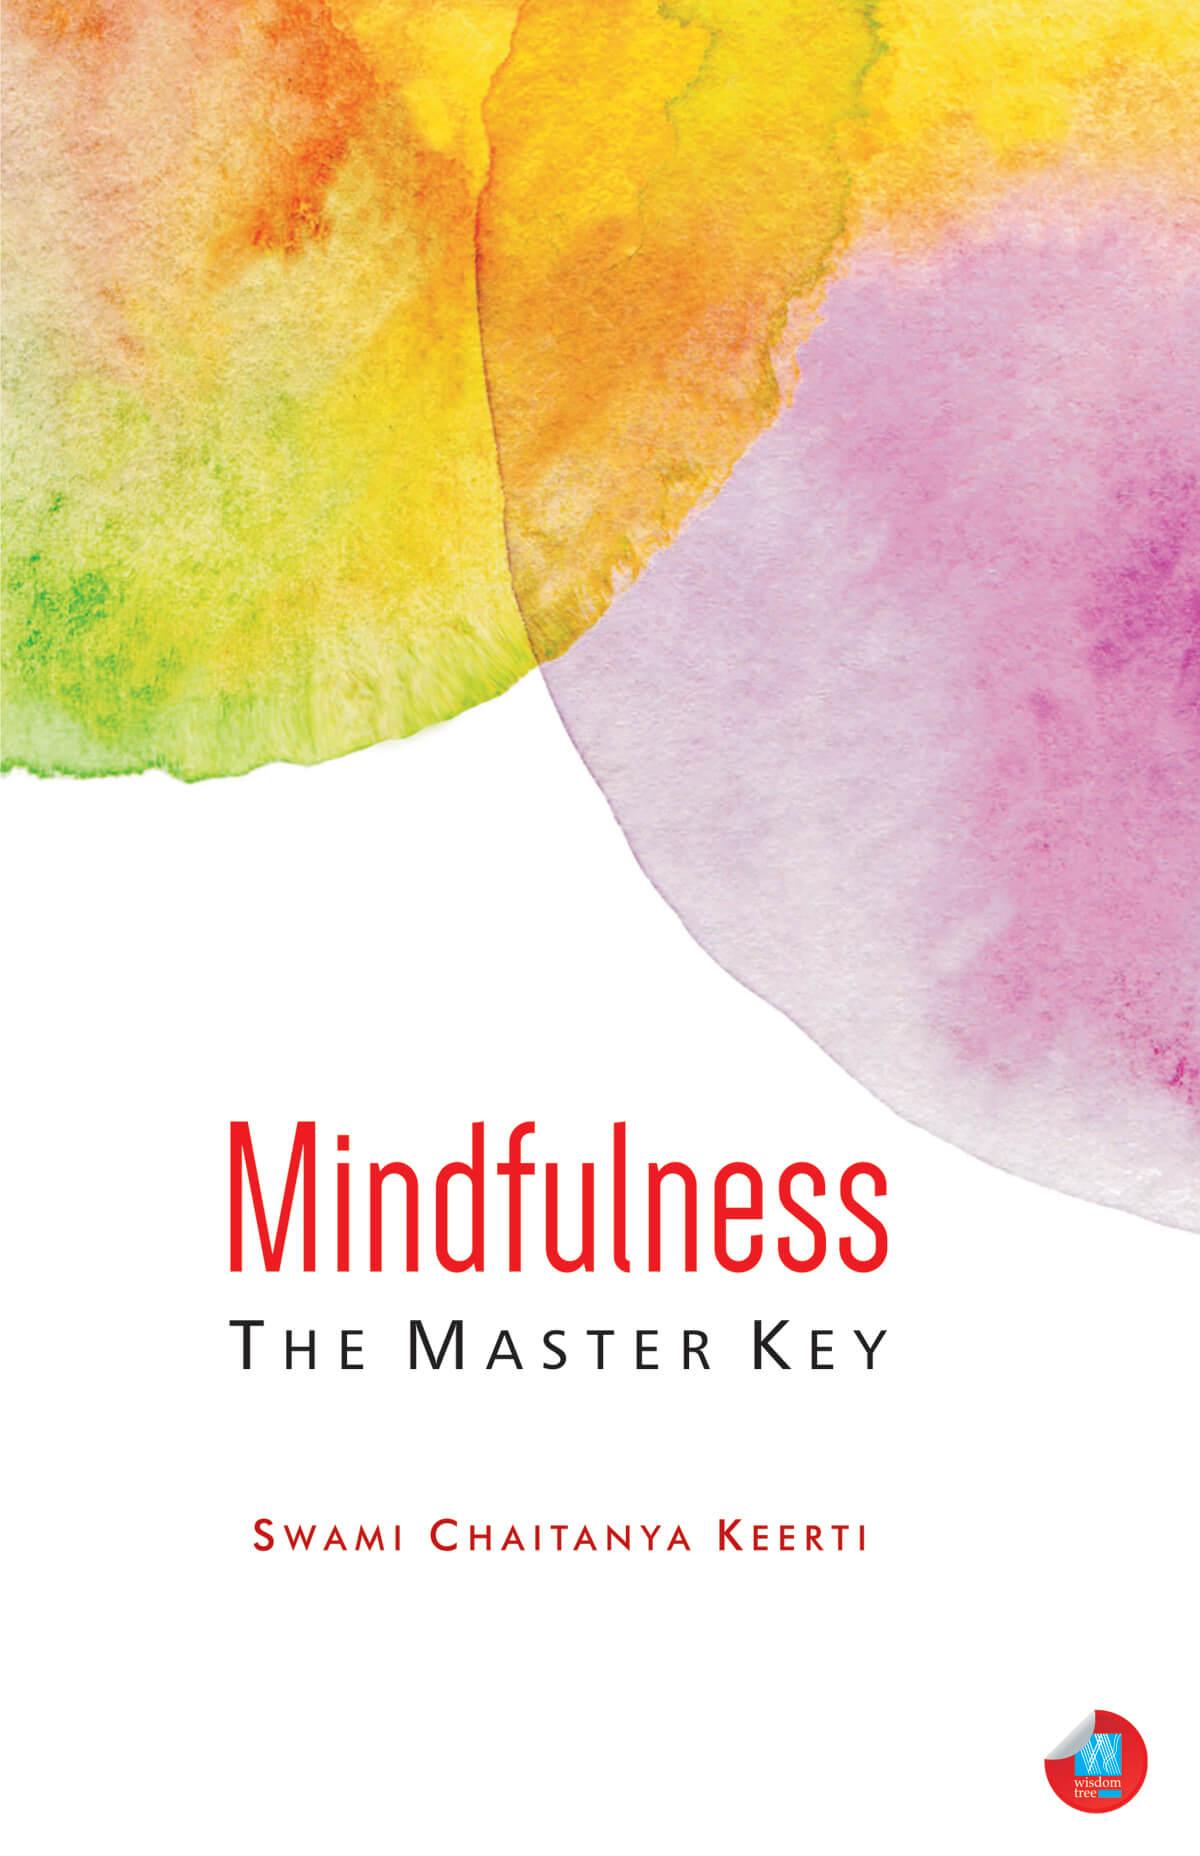 Mindfulness: The Master Key